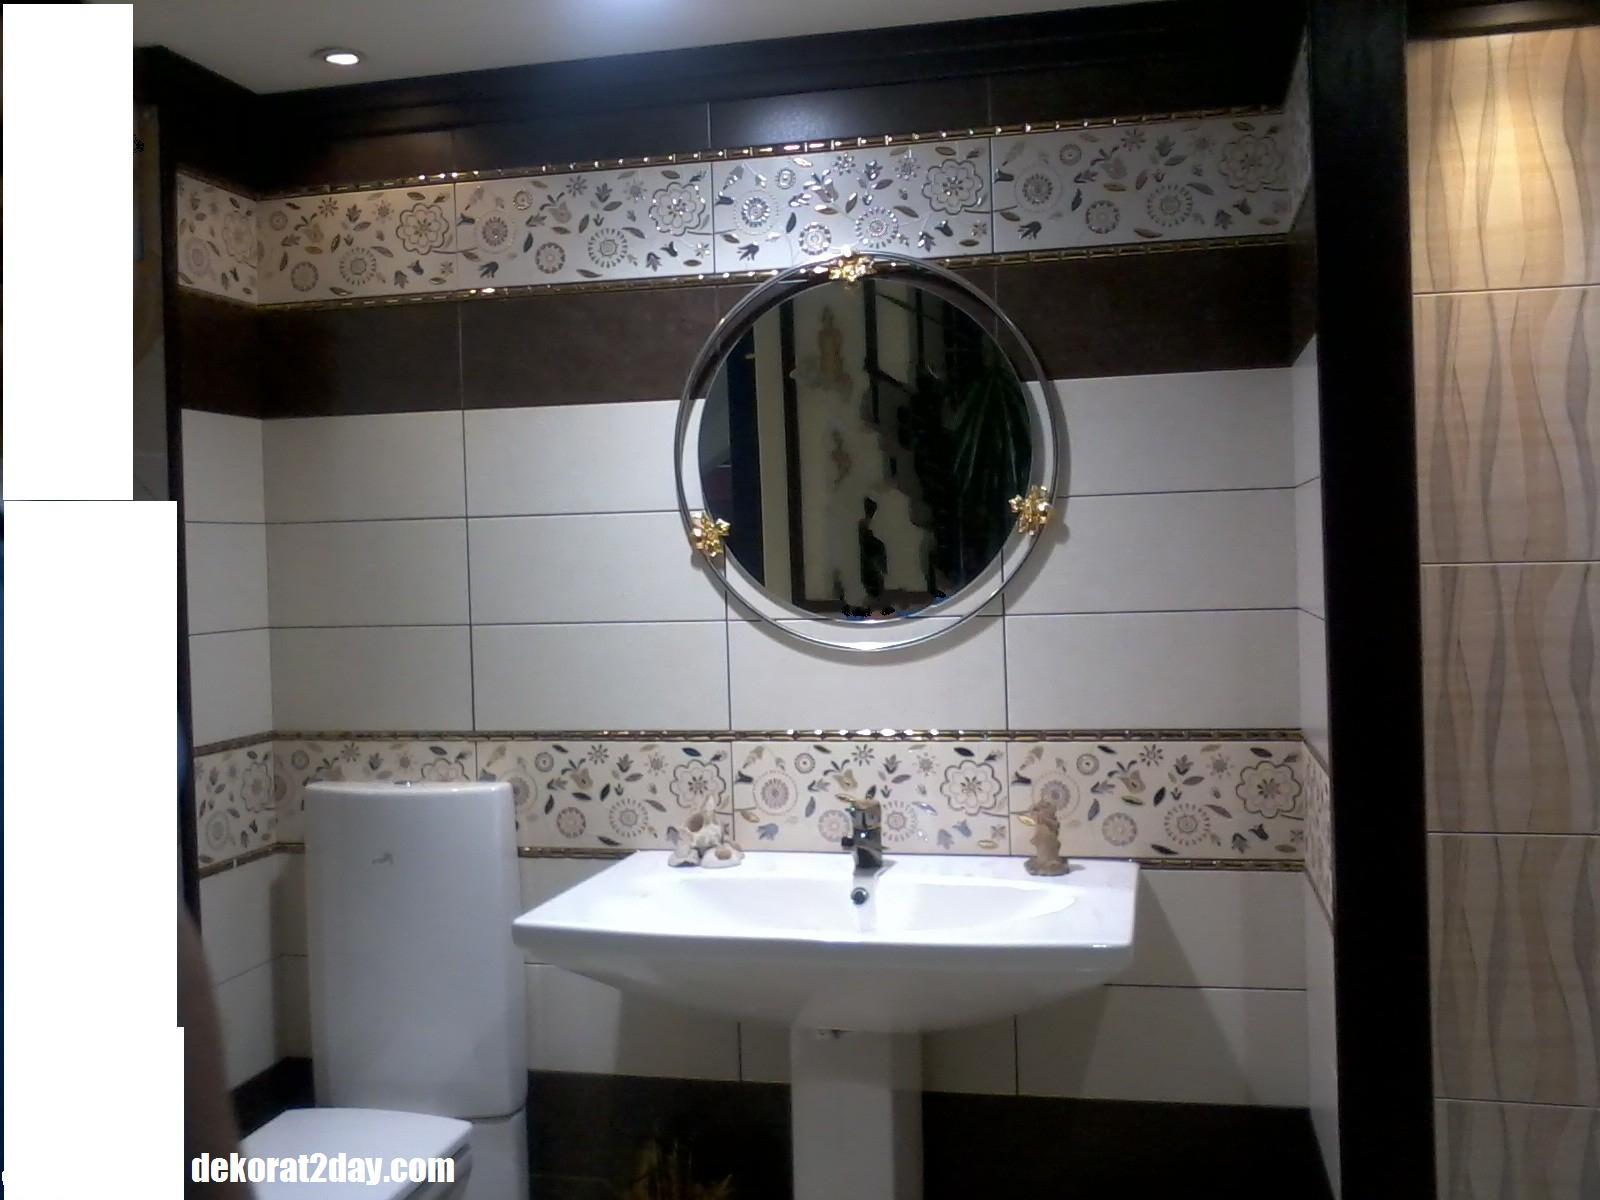 صور سيراميكا كليوباترا حمامات , شاهد حمامات سيراميكا كيلوباترا